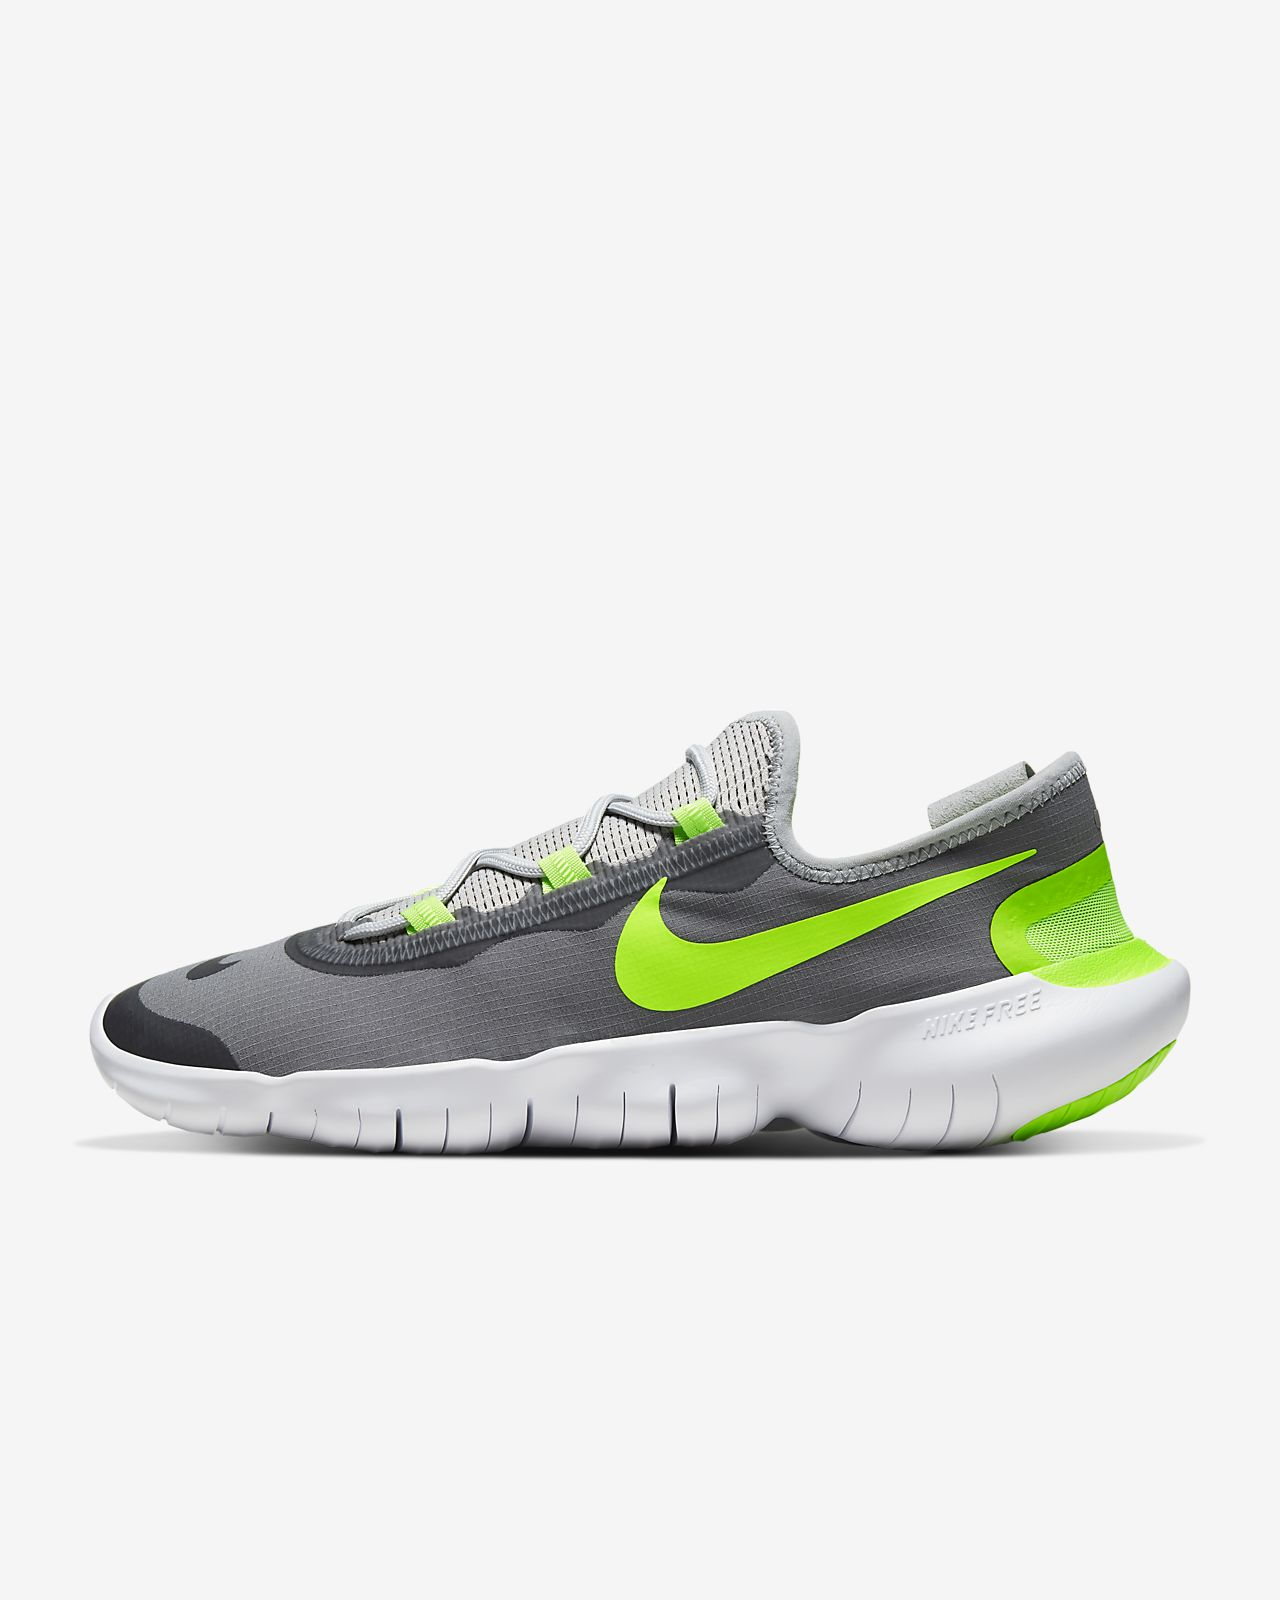 nike free run running shoes